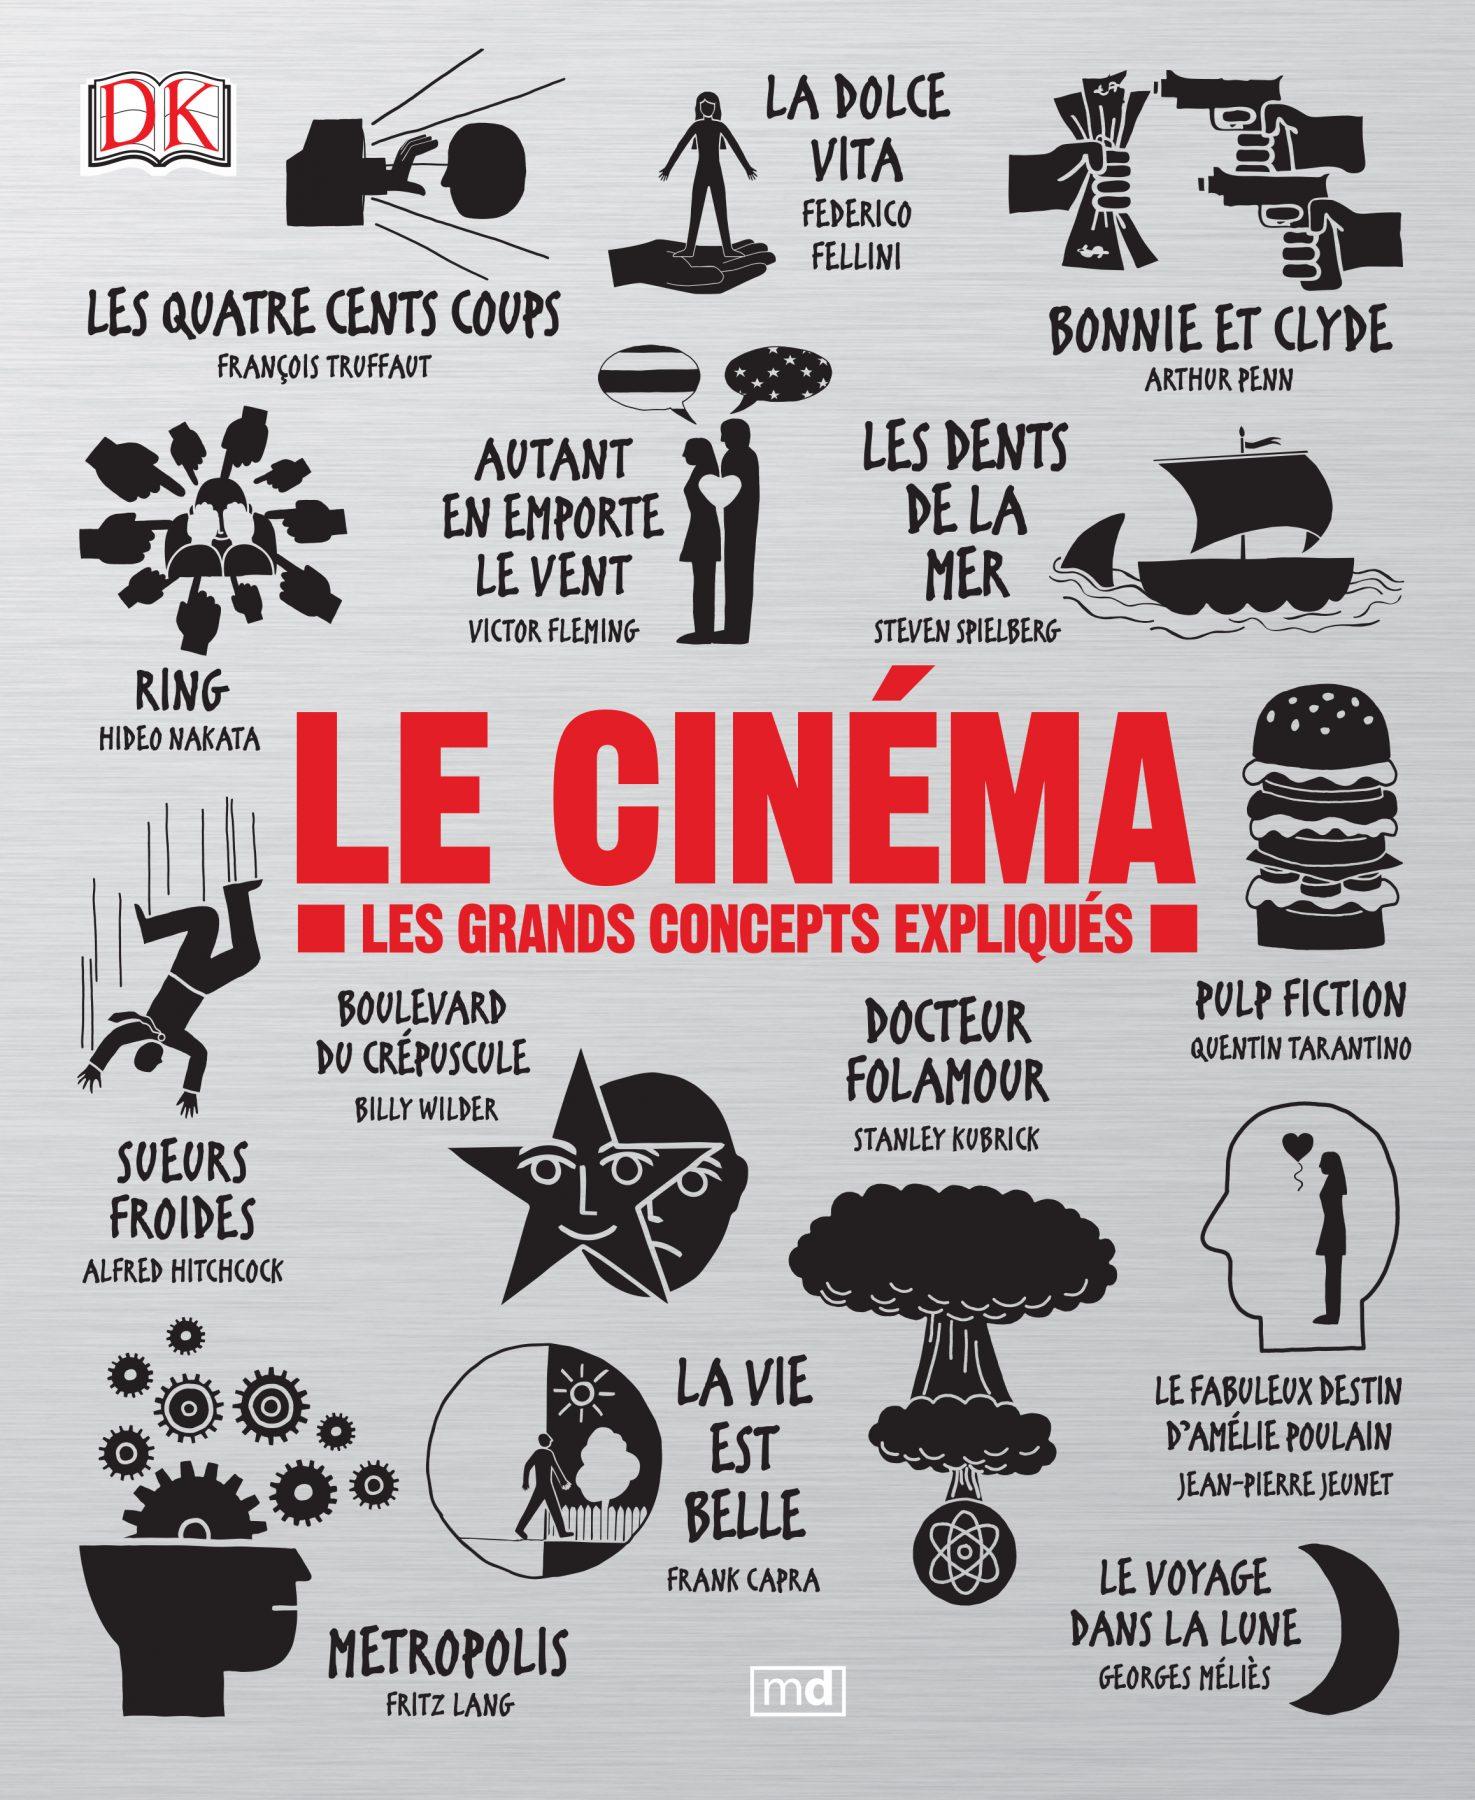 Livre: Le Cinéma – Les grands concepts expliqués